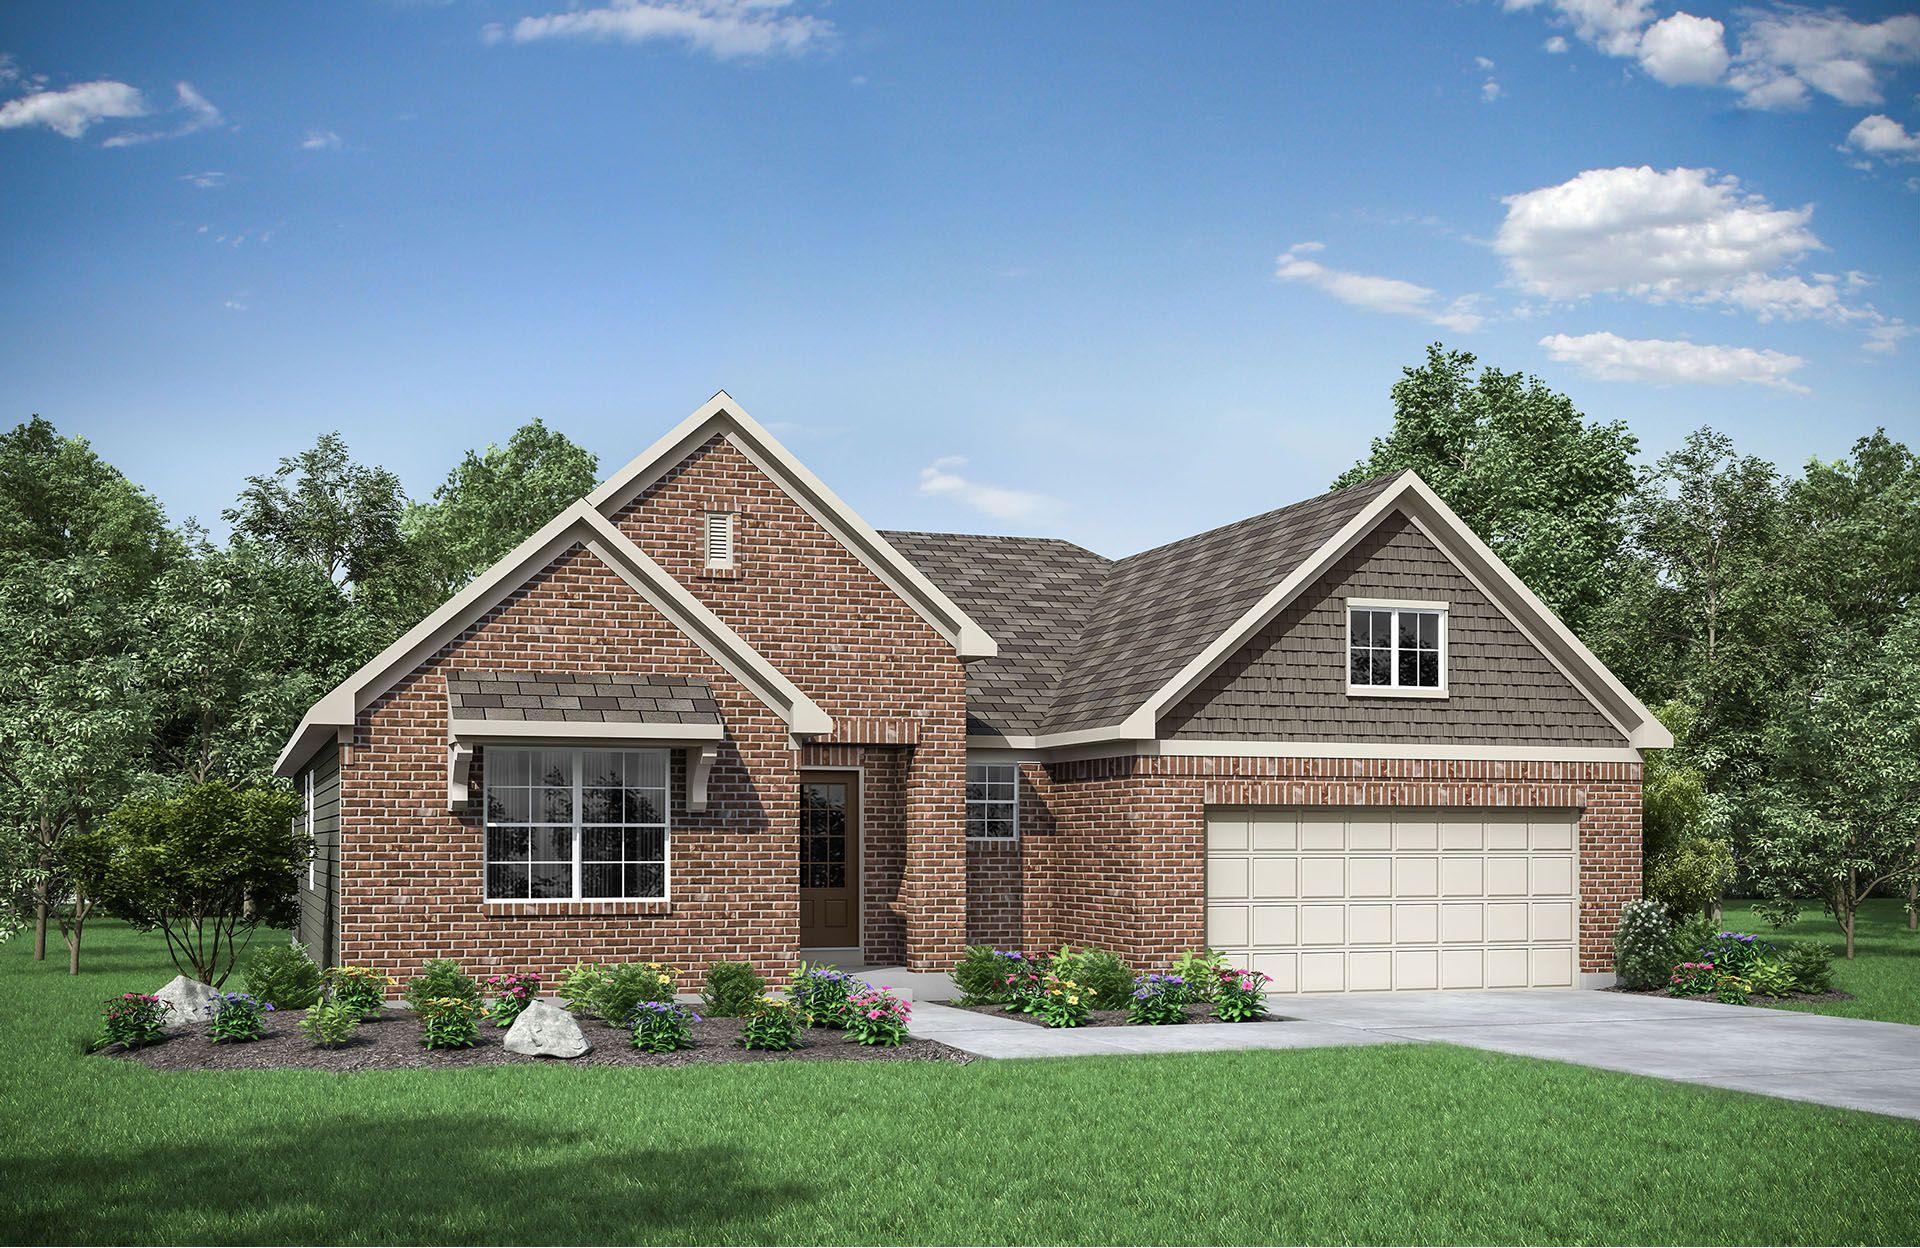 Single Family for Sale at Beachwood 3431 Southway Ridge Erlanger, Kentucky 41018 United States